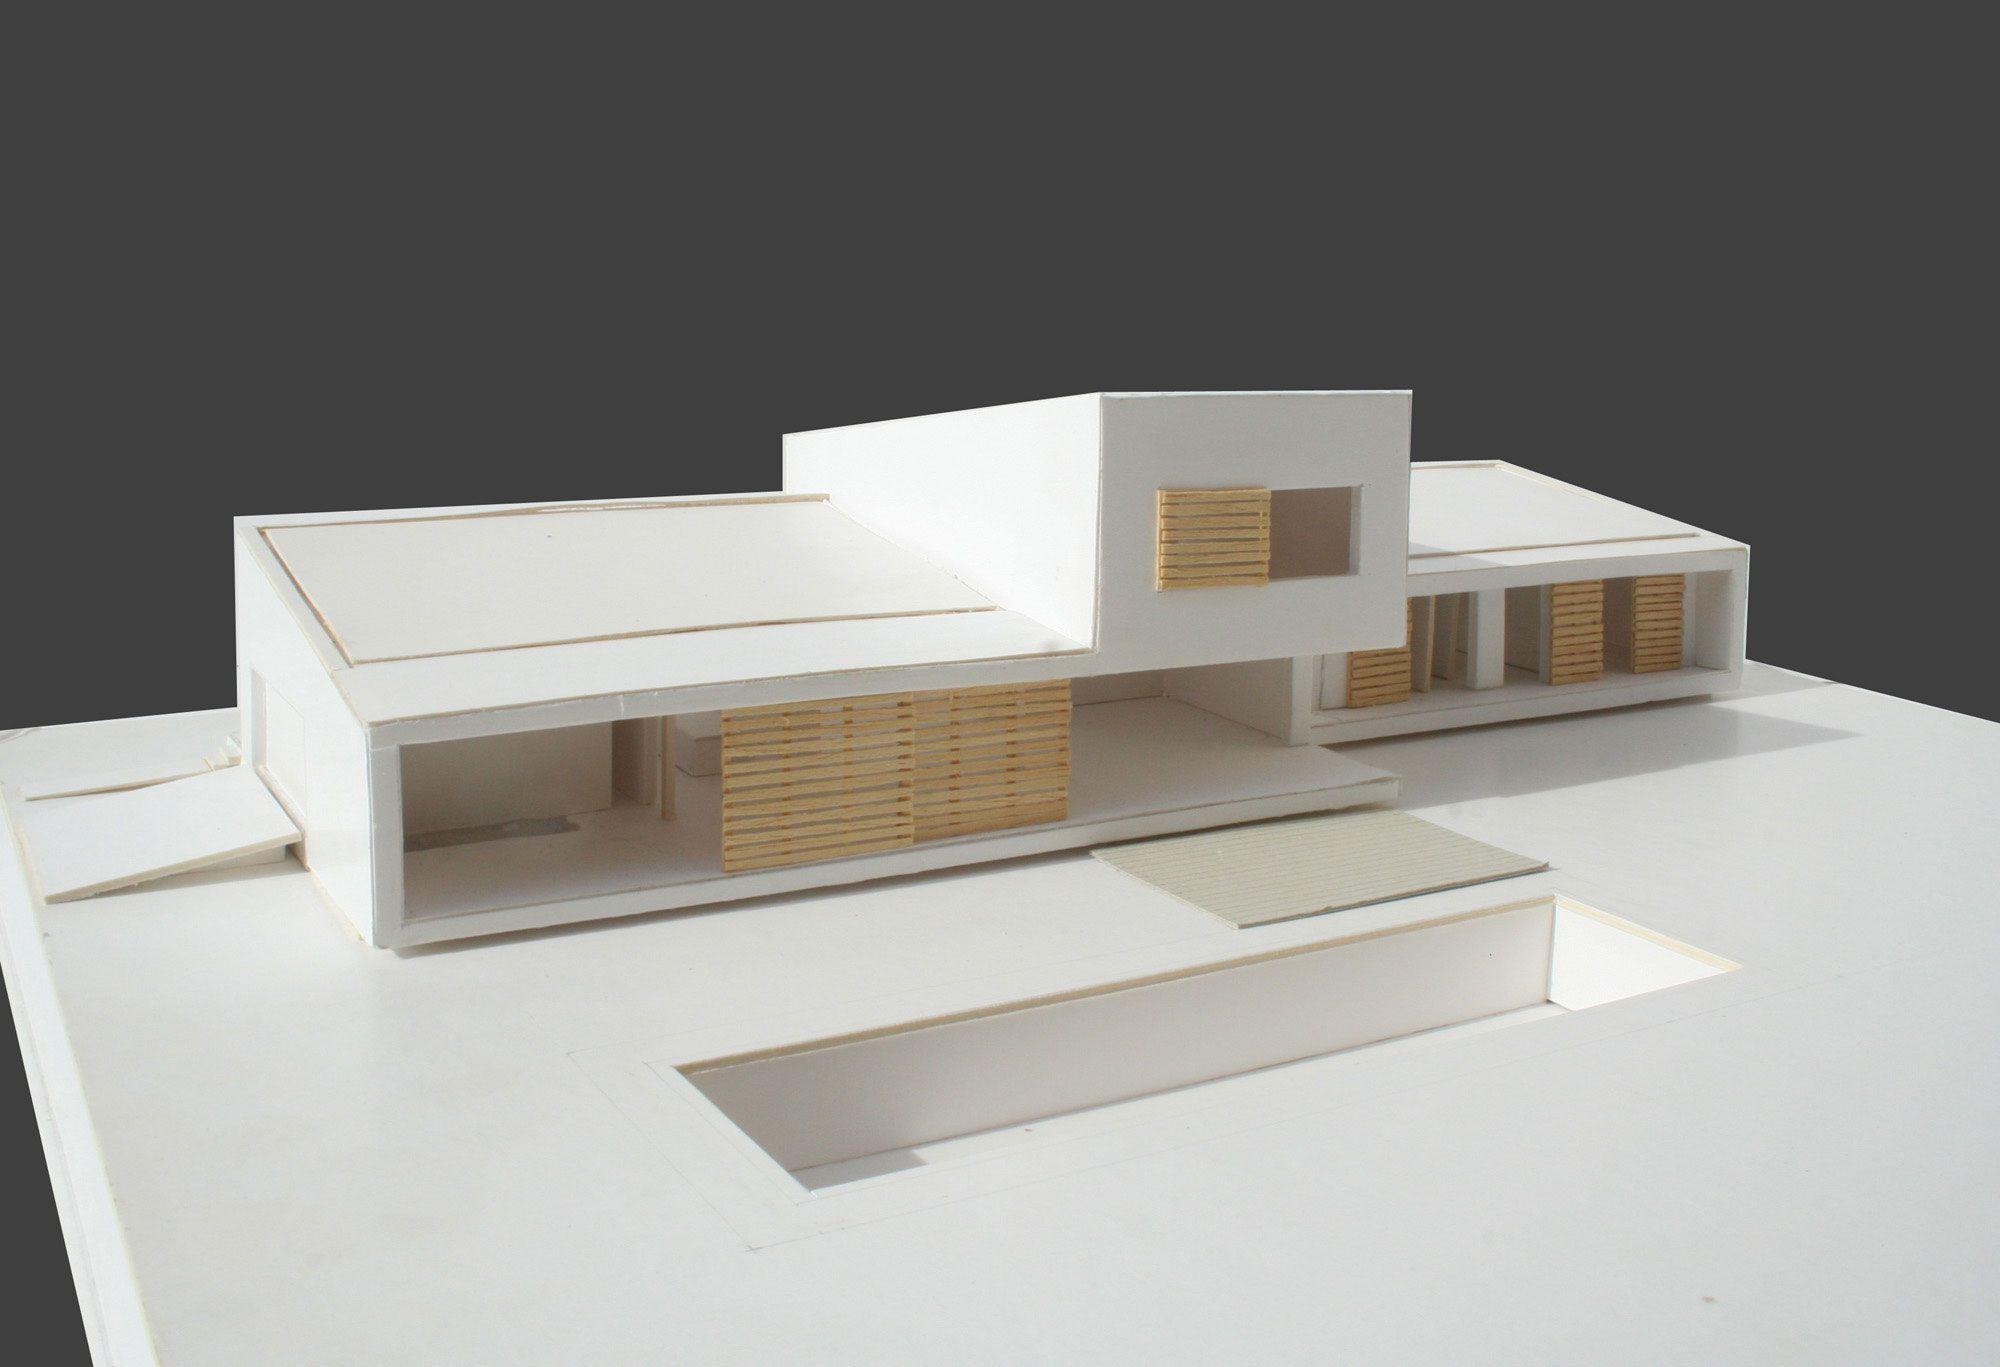 Casa-Bauzà-23